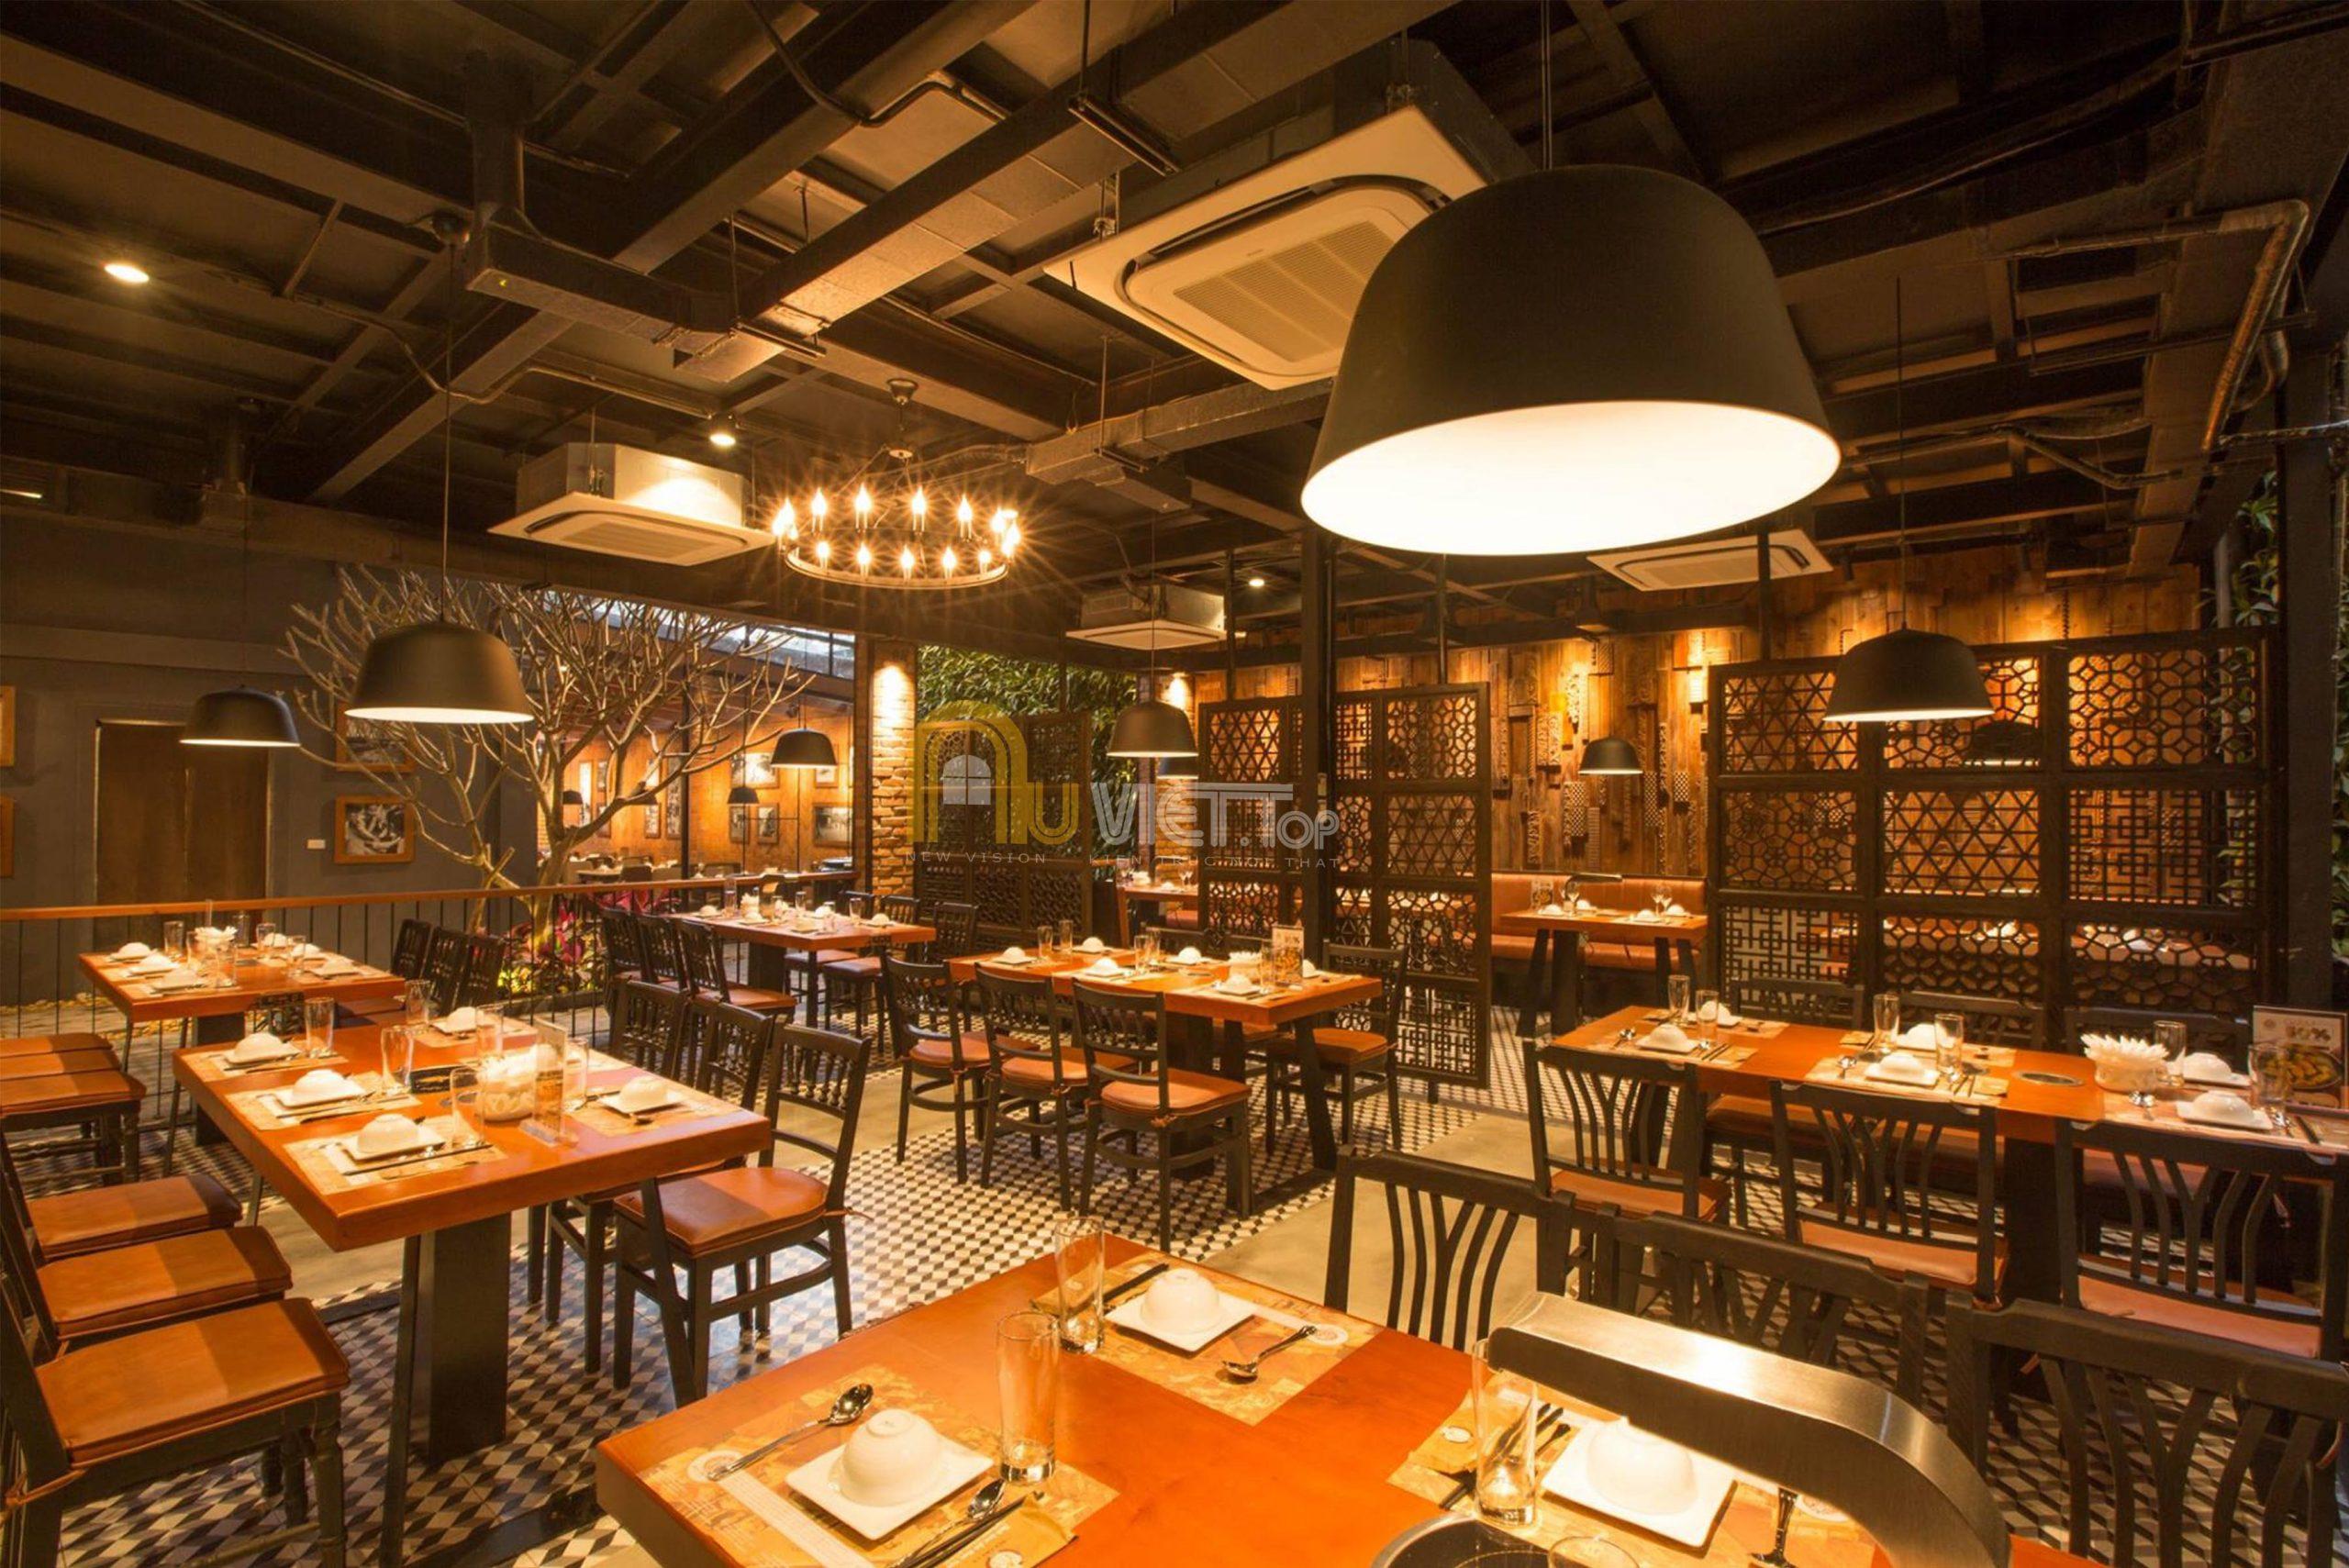 thiet ke noi that Restaurant vua cha ca tang 1 scaled